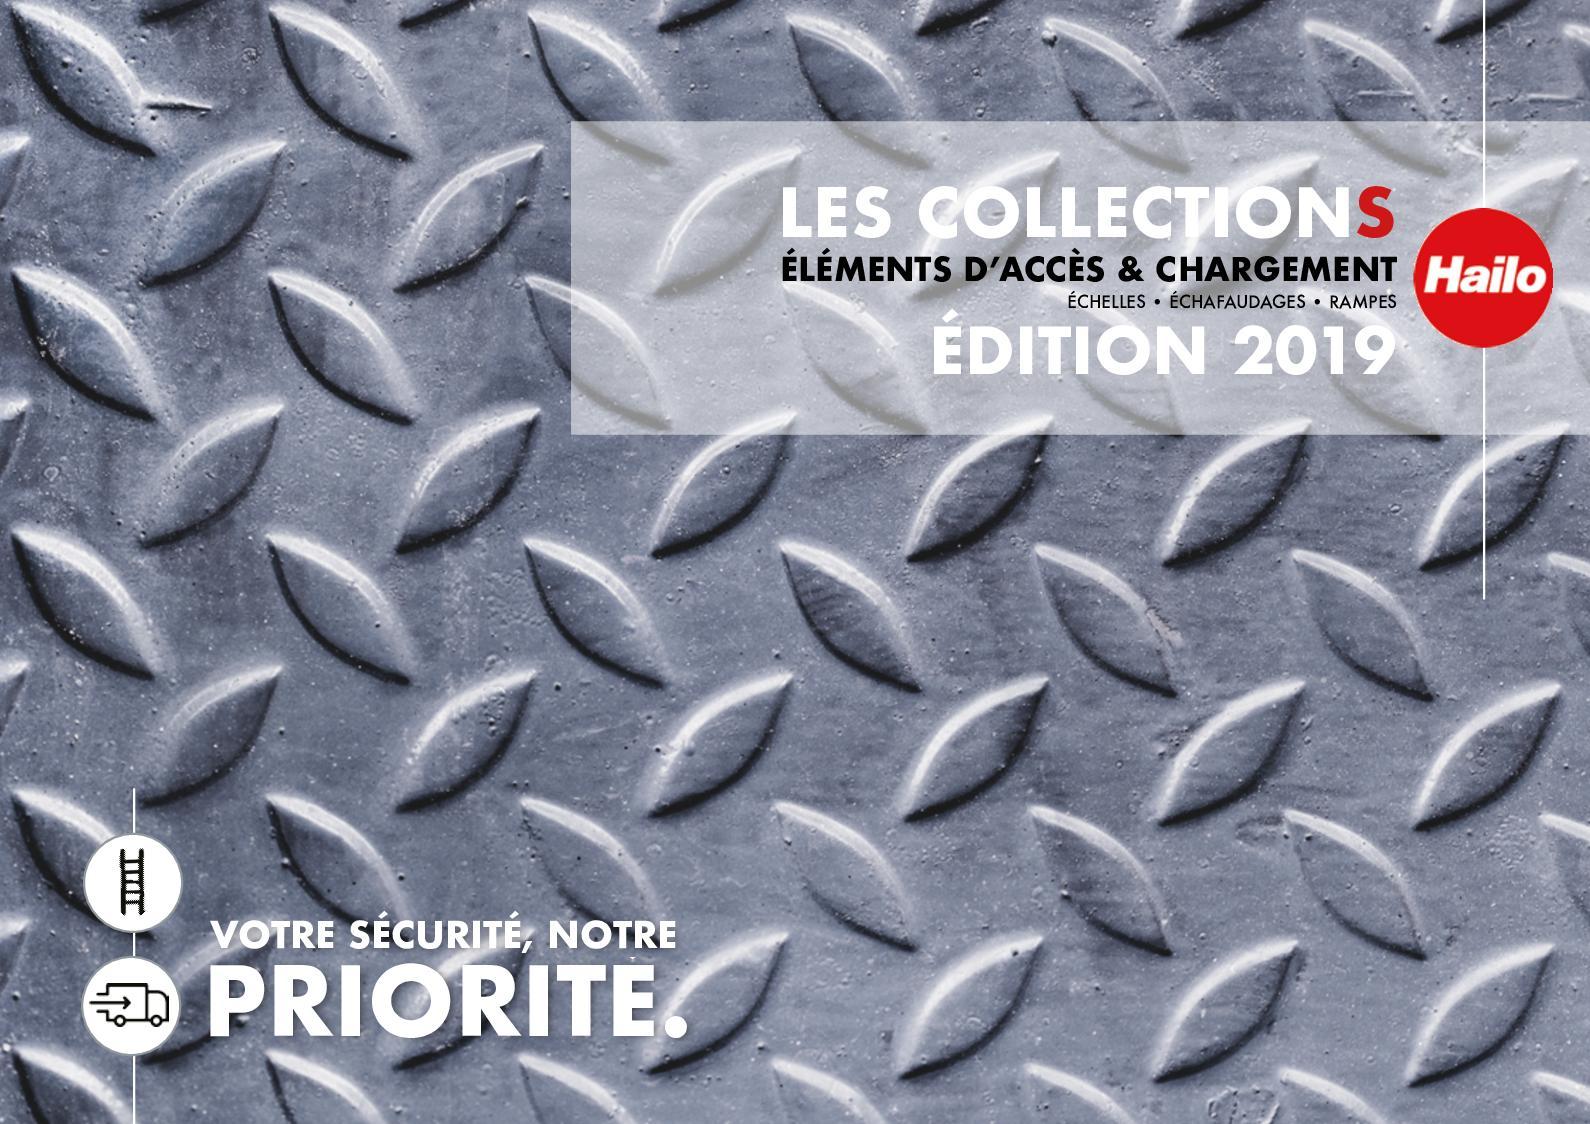 Calaméo Collections Matériaux Leroy Merlin X Hailo 2019